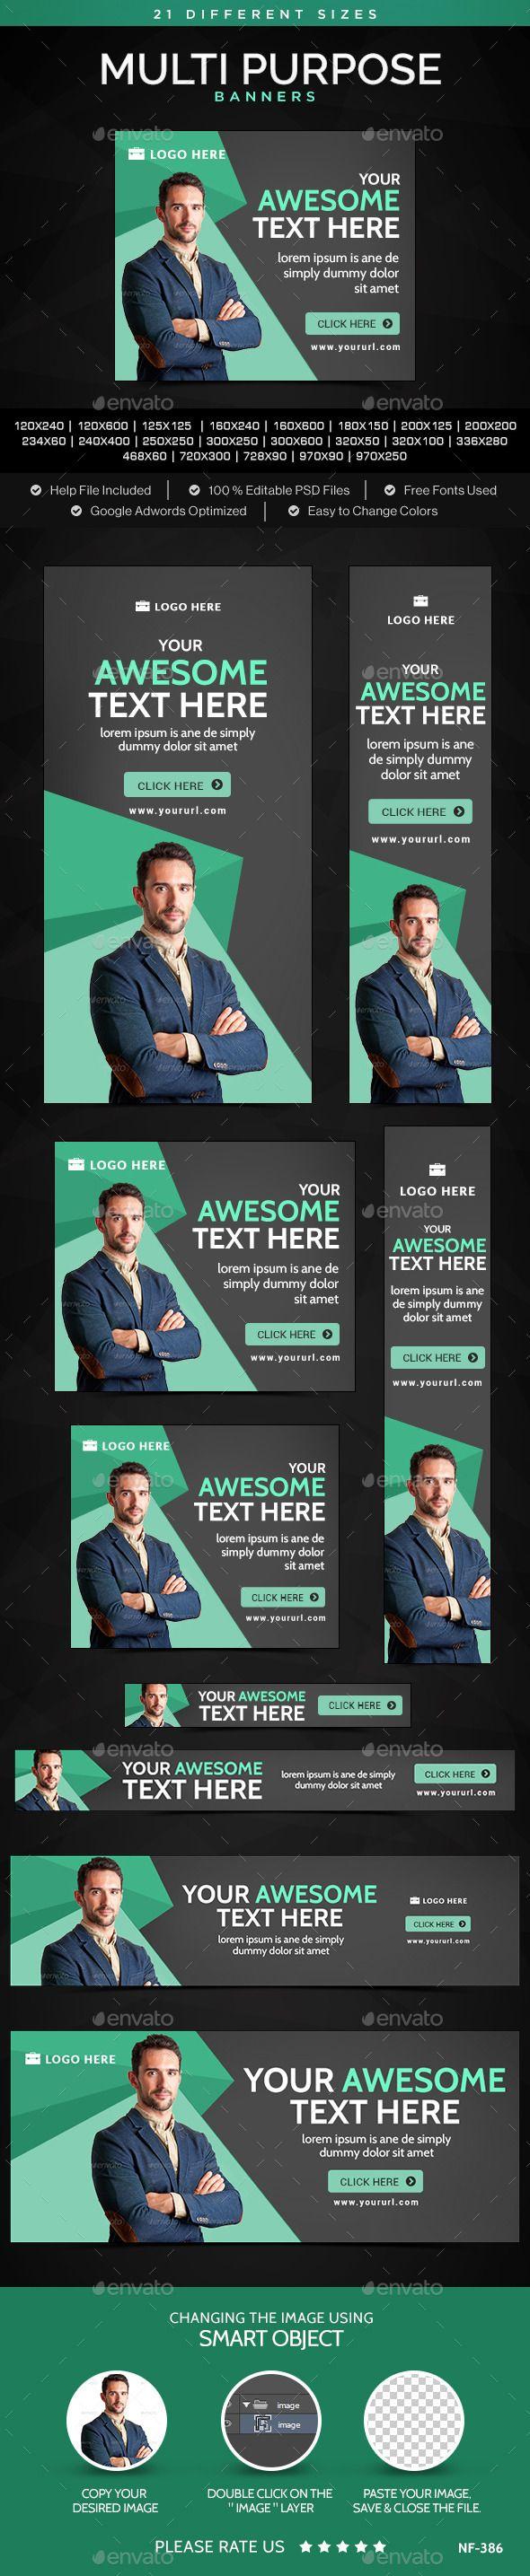 383 best Advertising │ Google Banners images on Pinterest | Banner ...